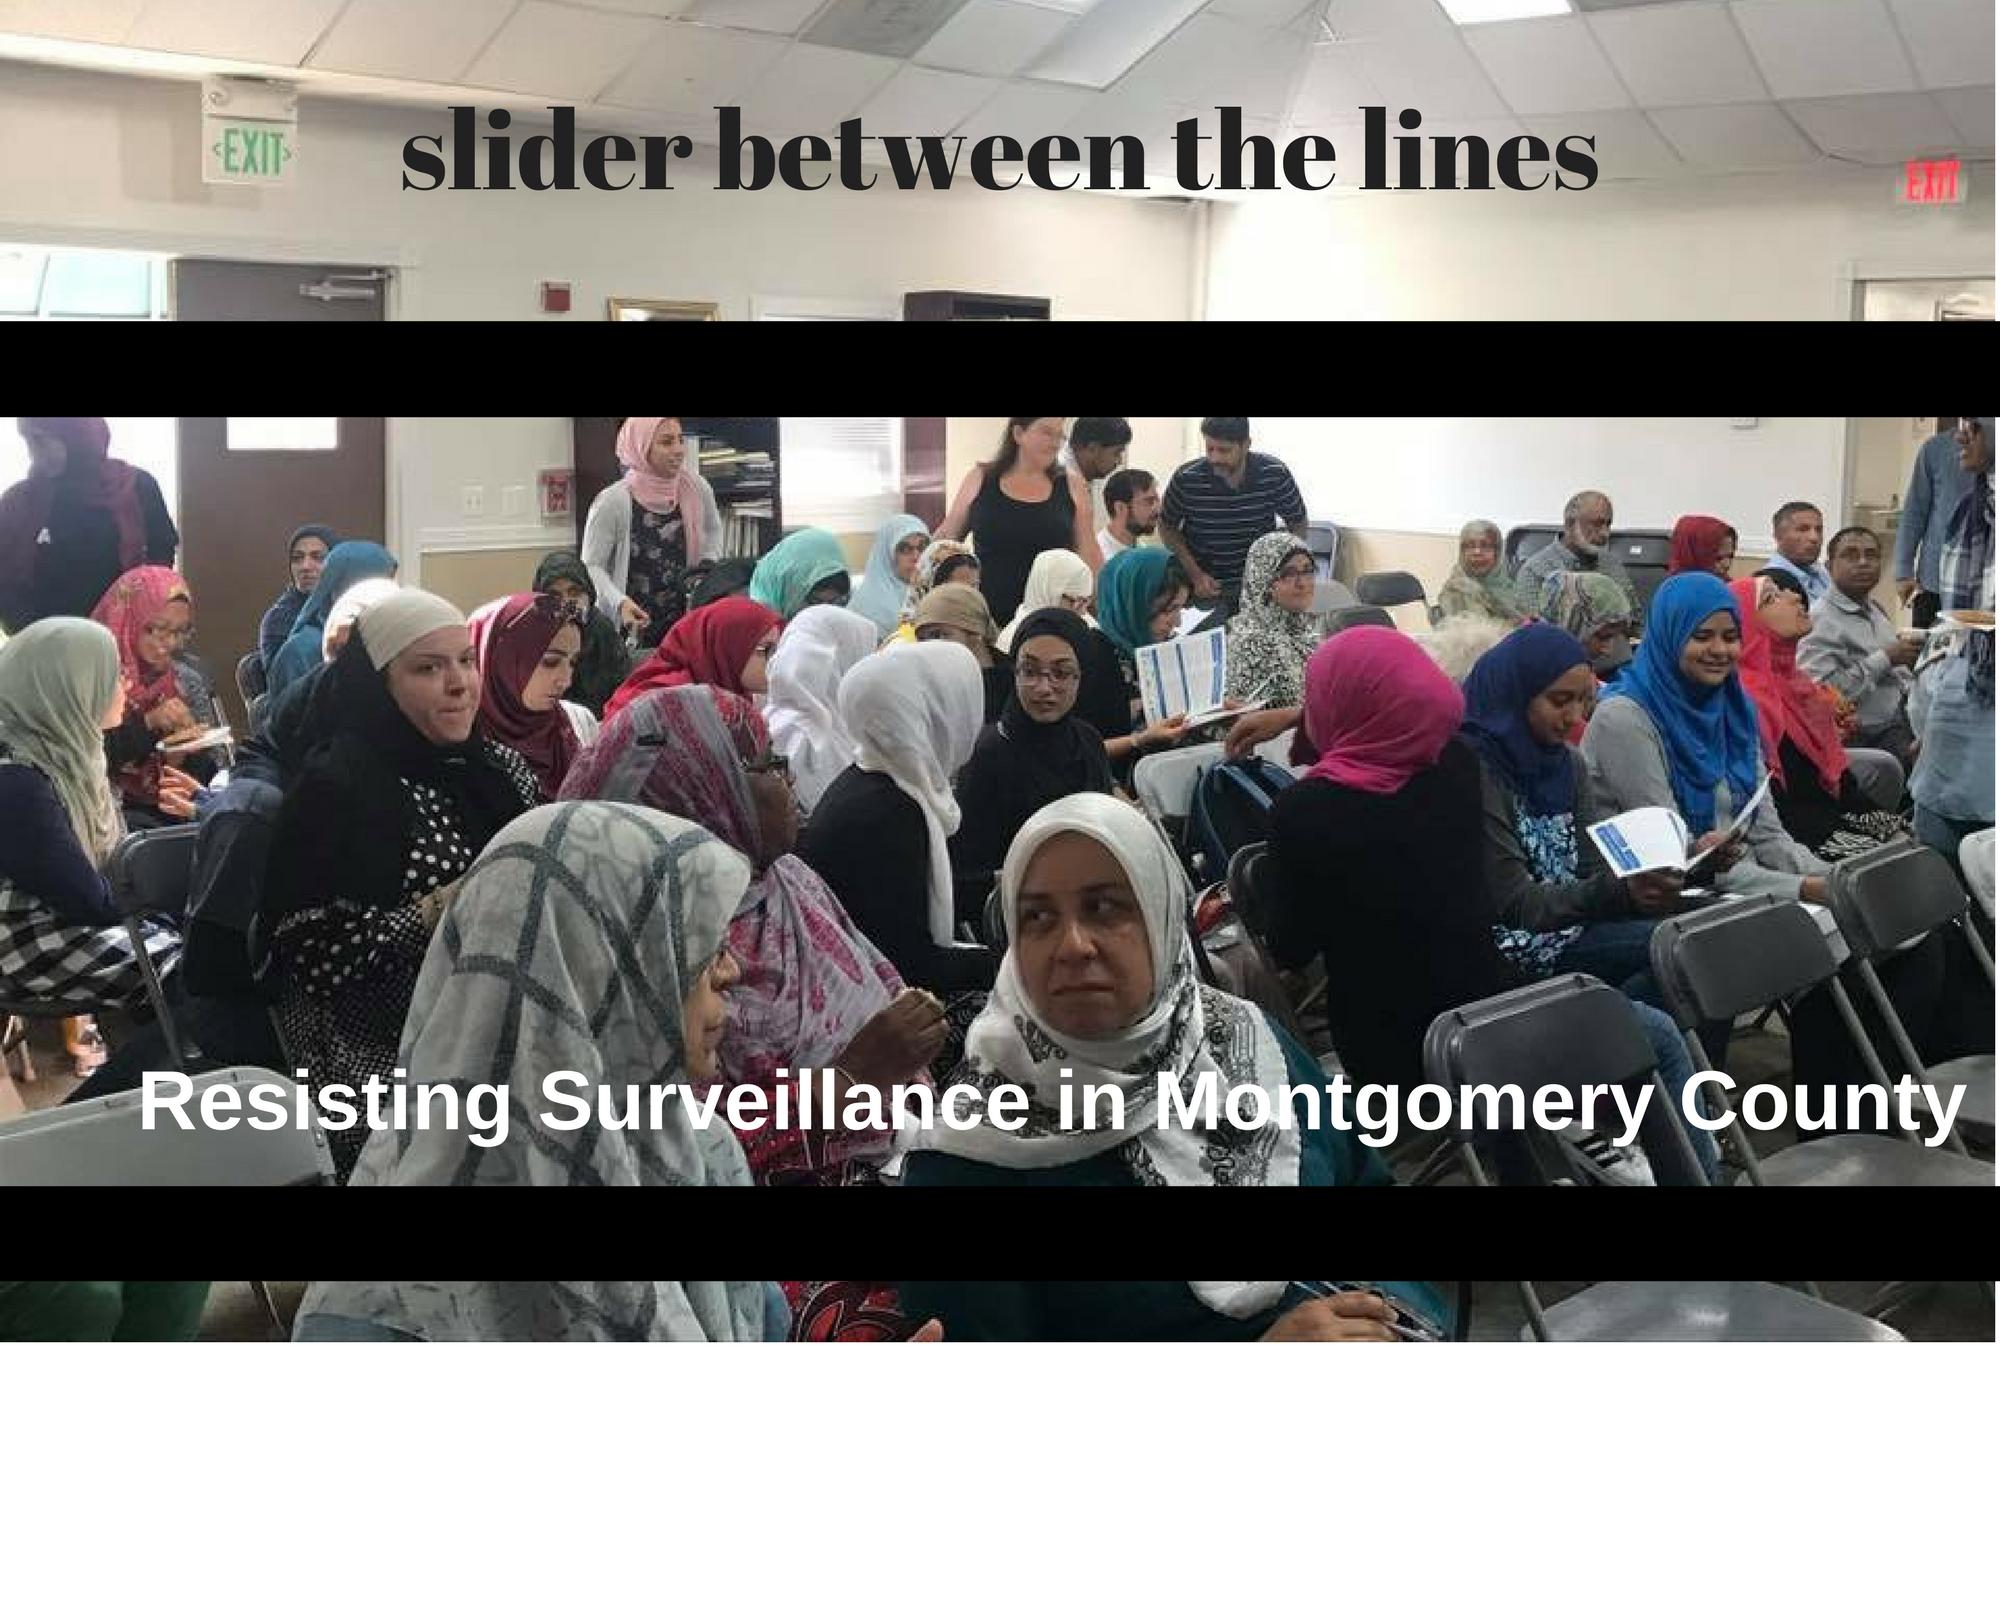 resisting surveillance